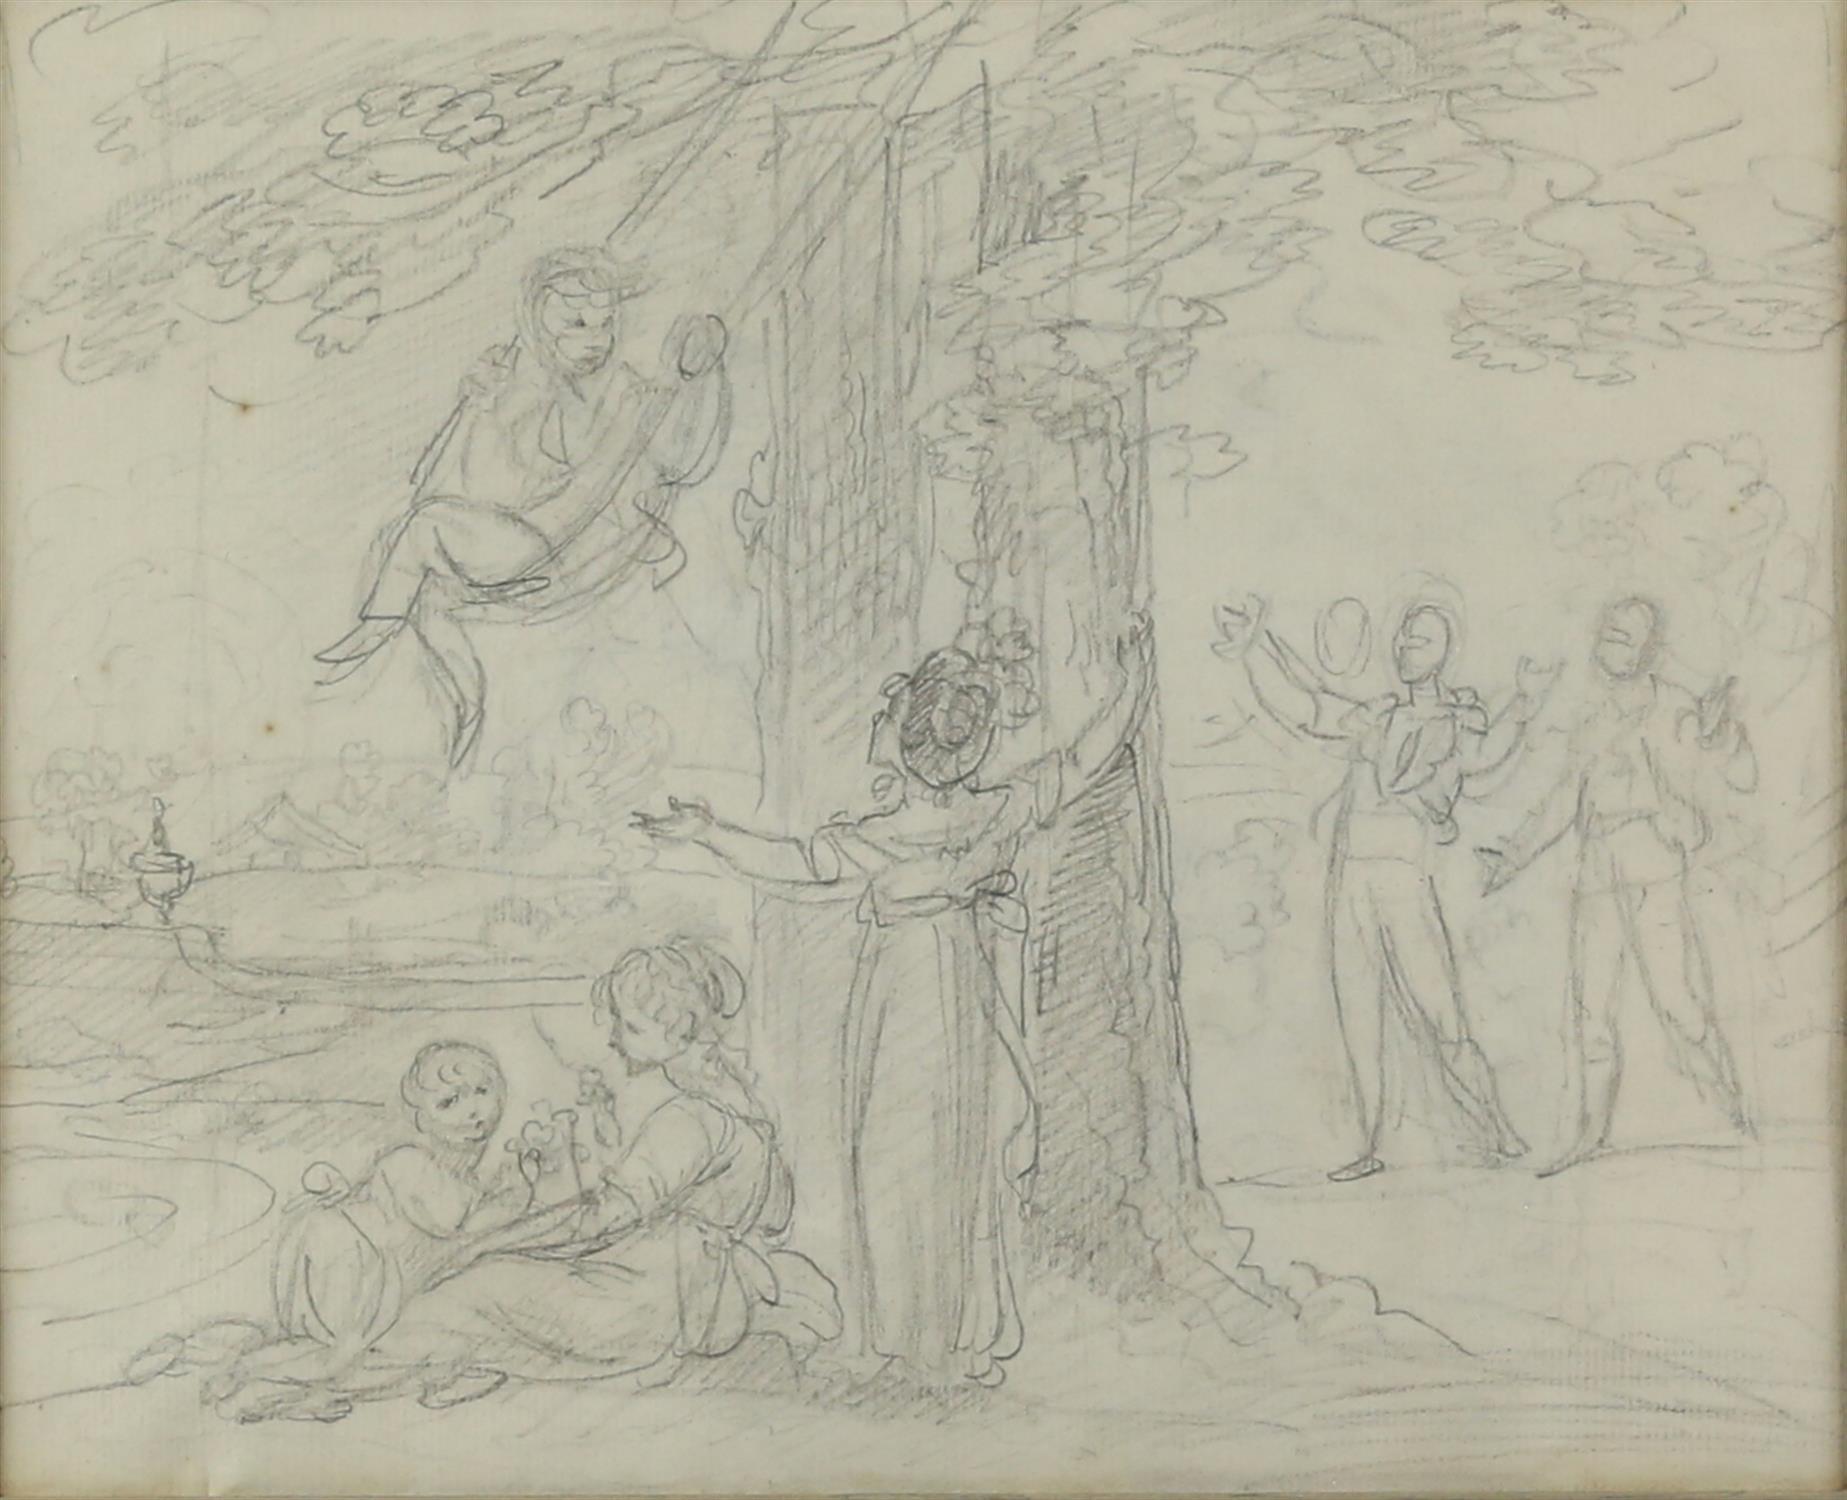 Maria Spilsbury (British, 1777- c. 1823), 'Swinging' pencil drawing, 18cm x 22.5cm,